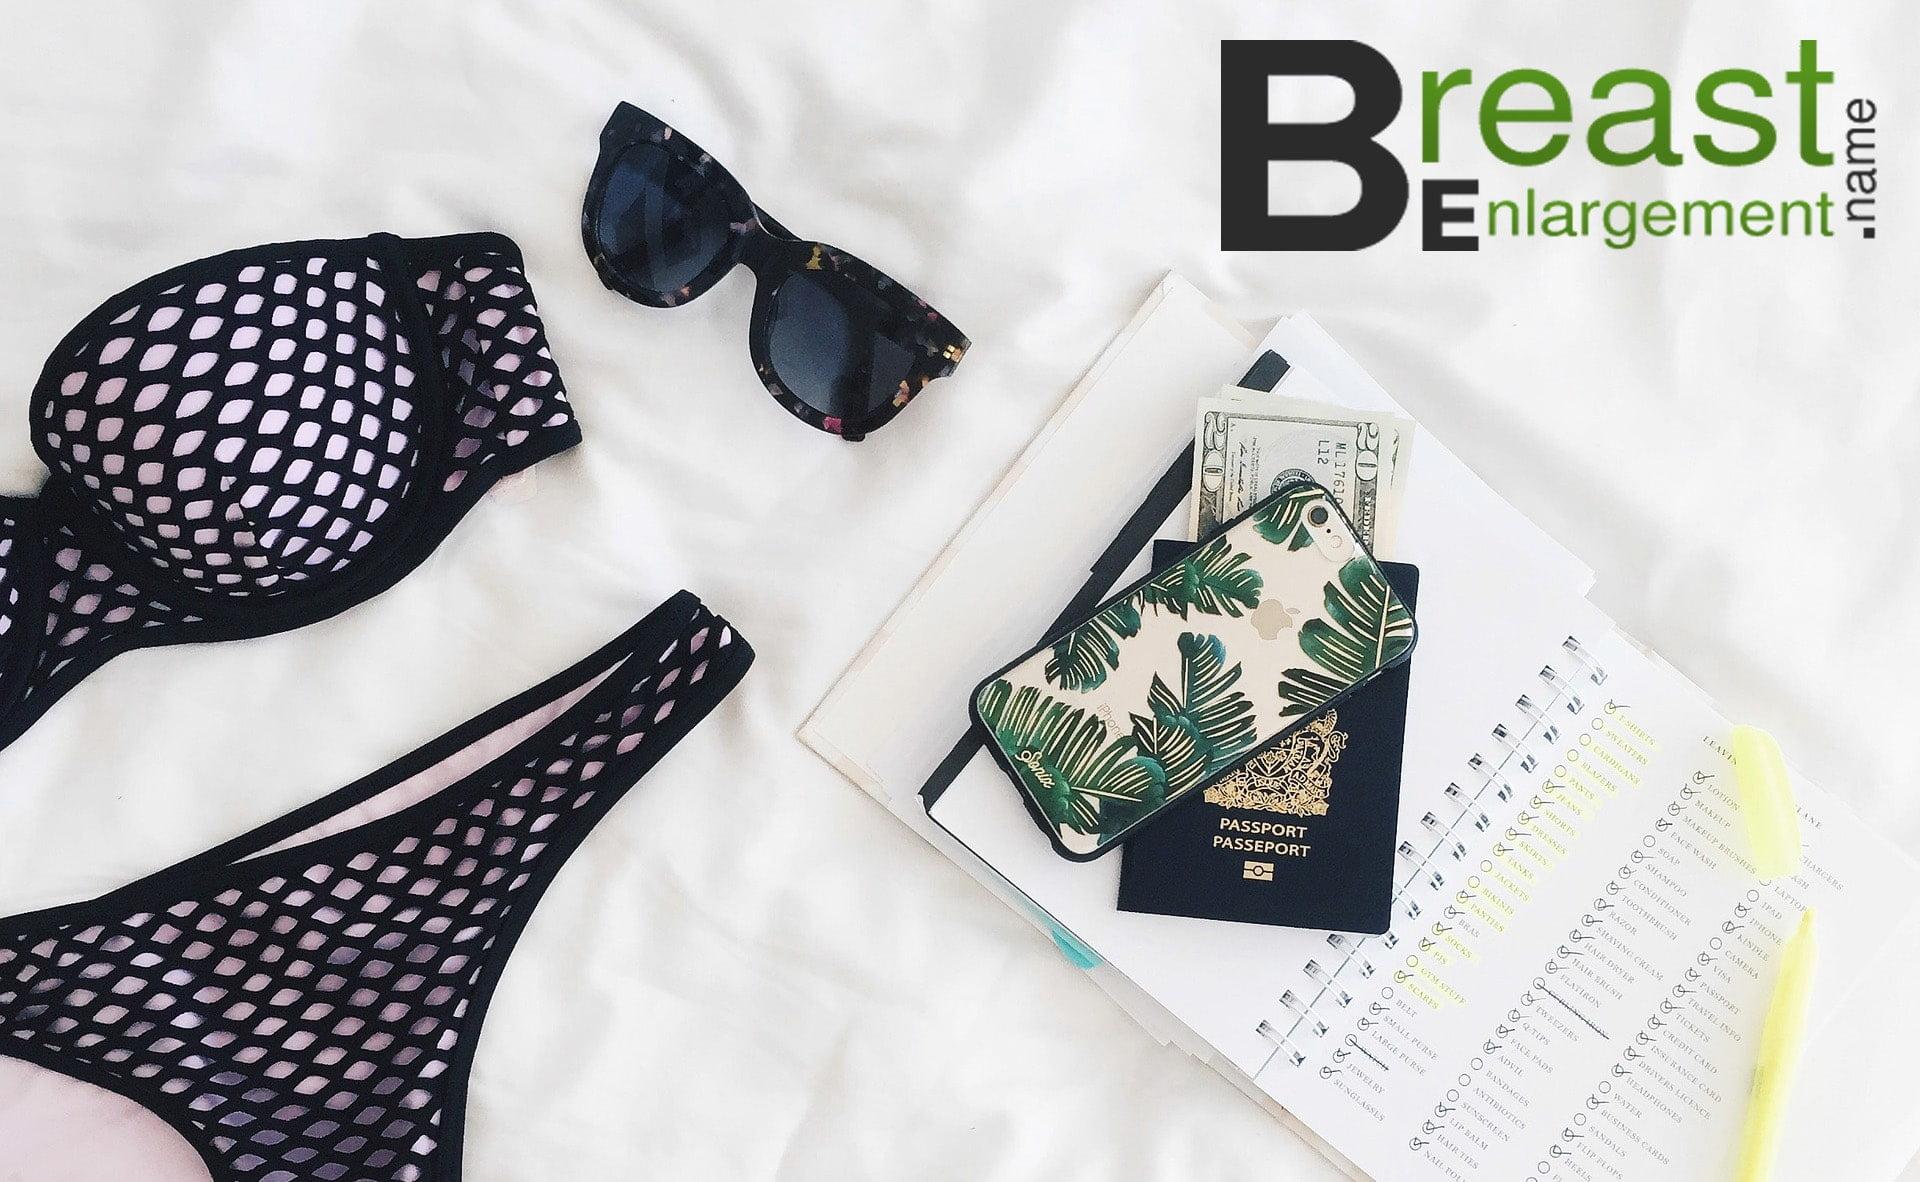 Journaling-55x5-breast-enlargement